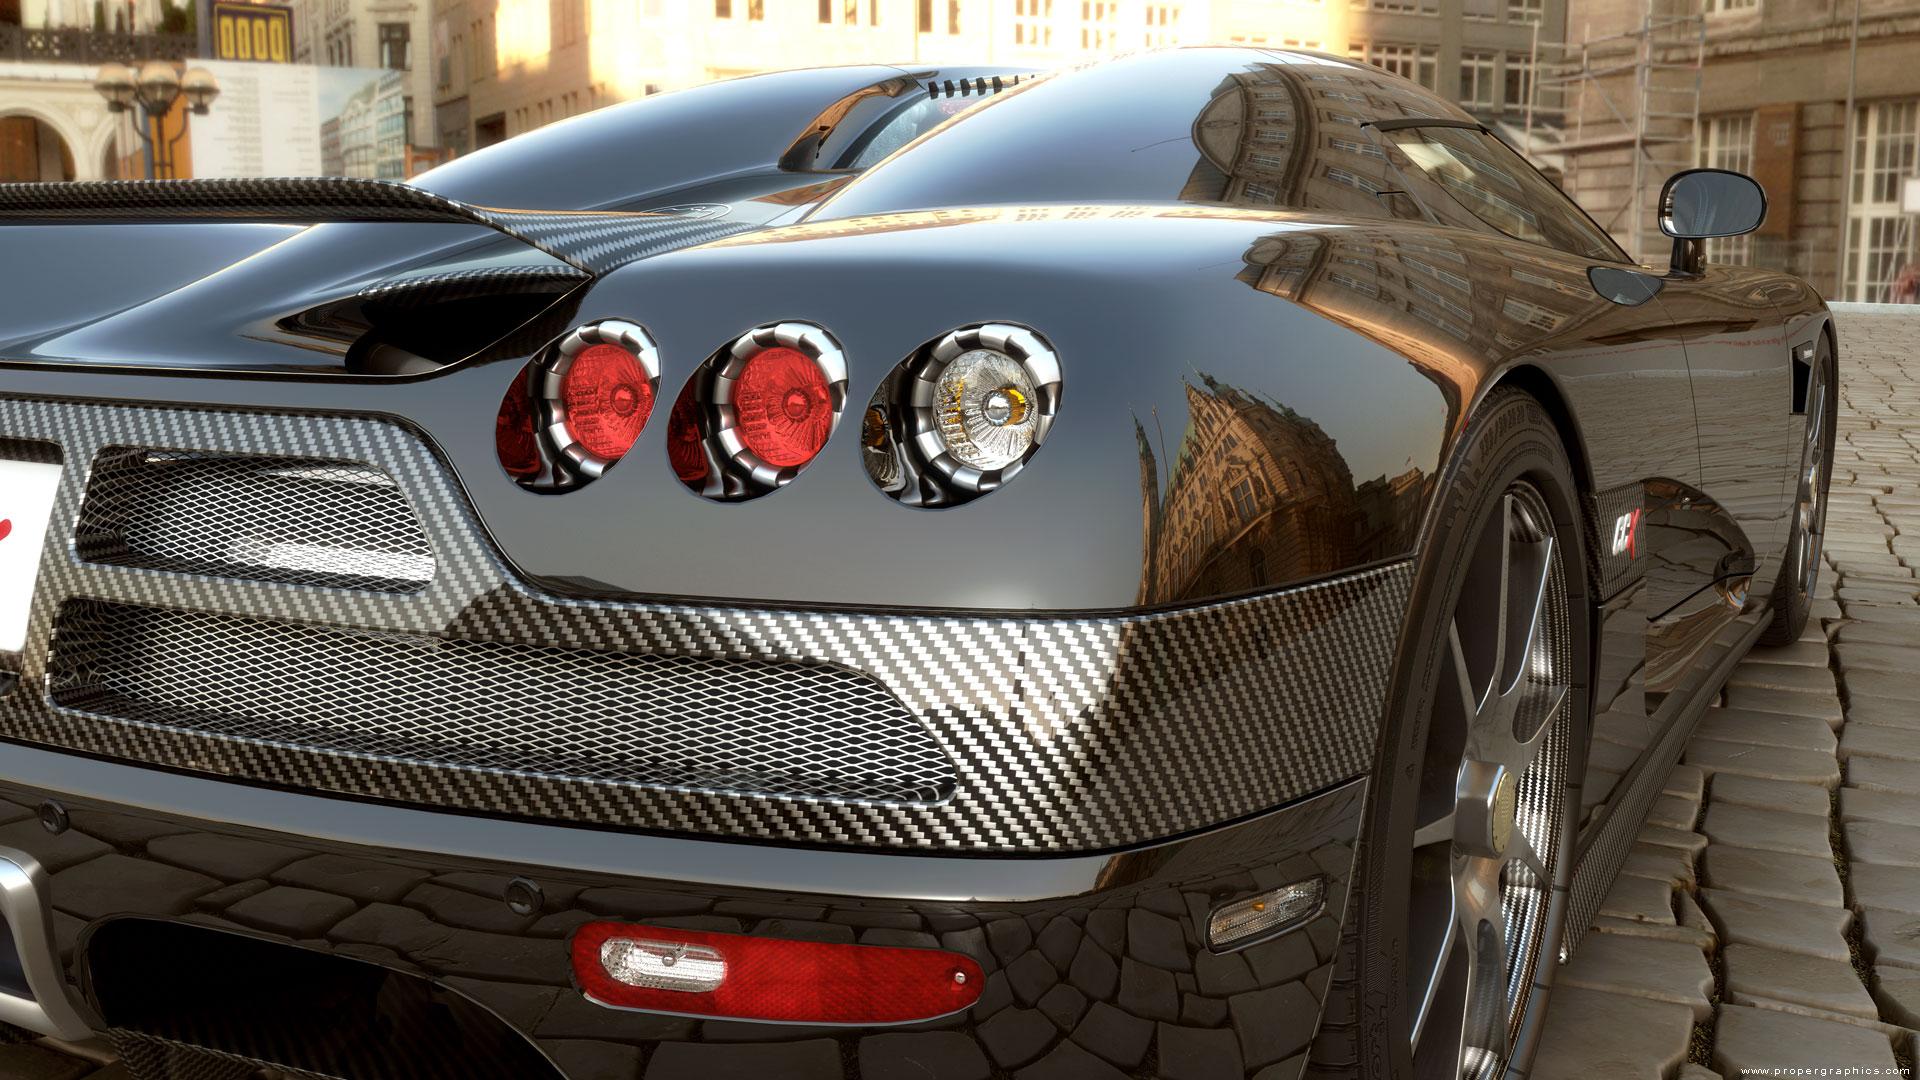 Carbon Fiber Bugatti Beautiful Images 473489 Wallpaper wallpaper